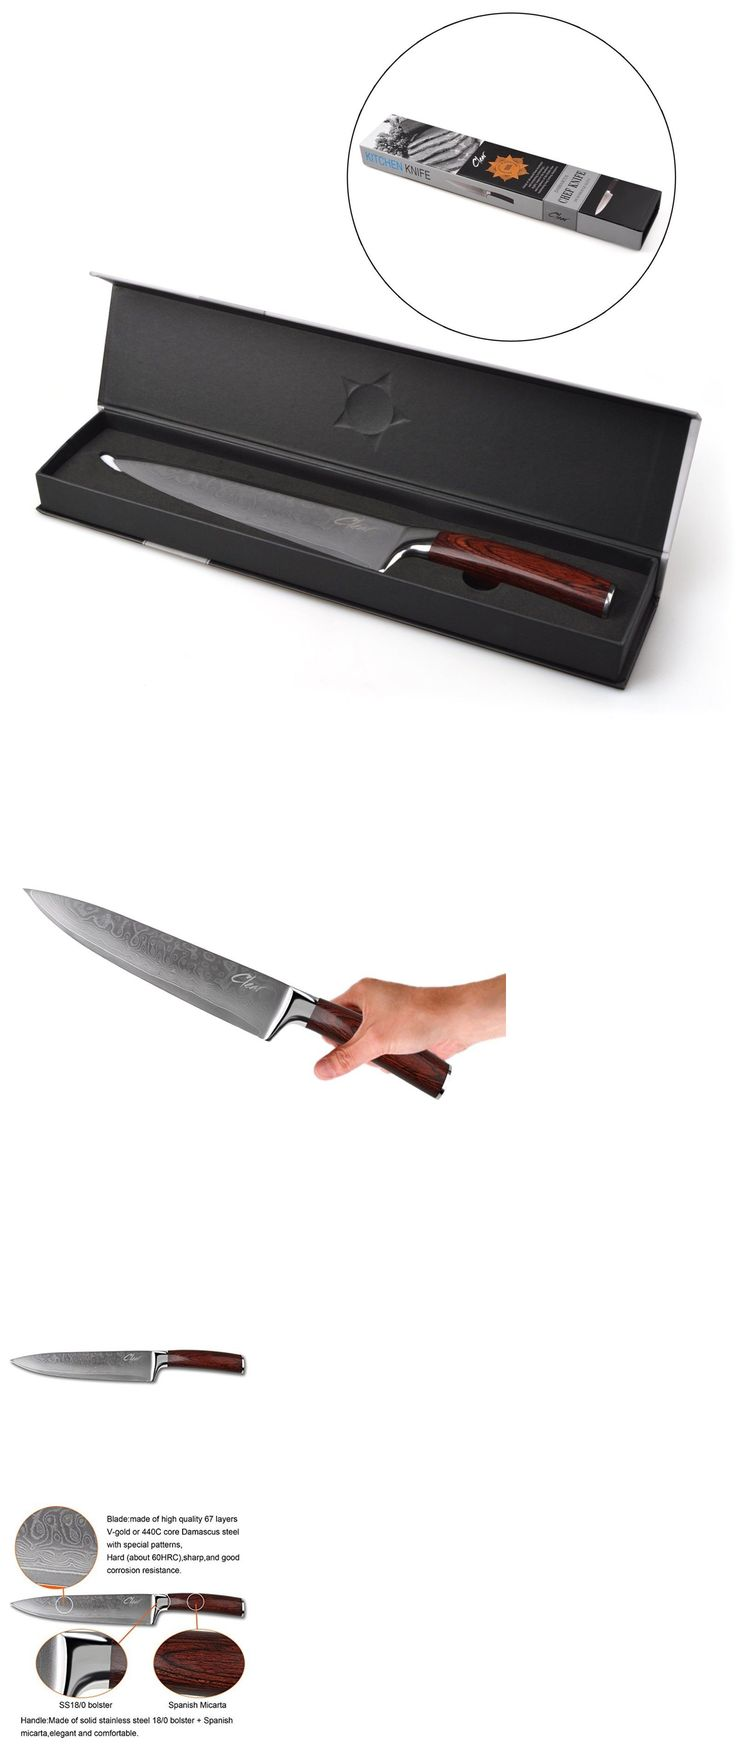 best 20 kitchen knives ideas on pinterest knife storage kitchen and steak knives 177005 handmade chef knife damascus steel blade kitchen knives brazilian wood